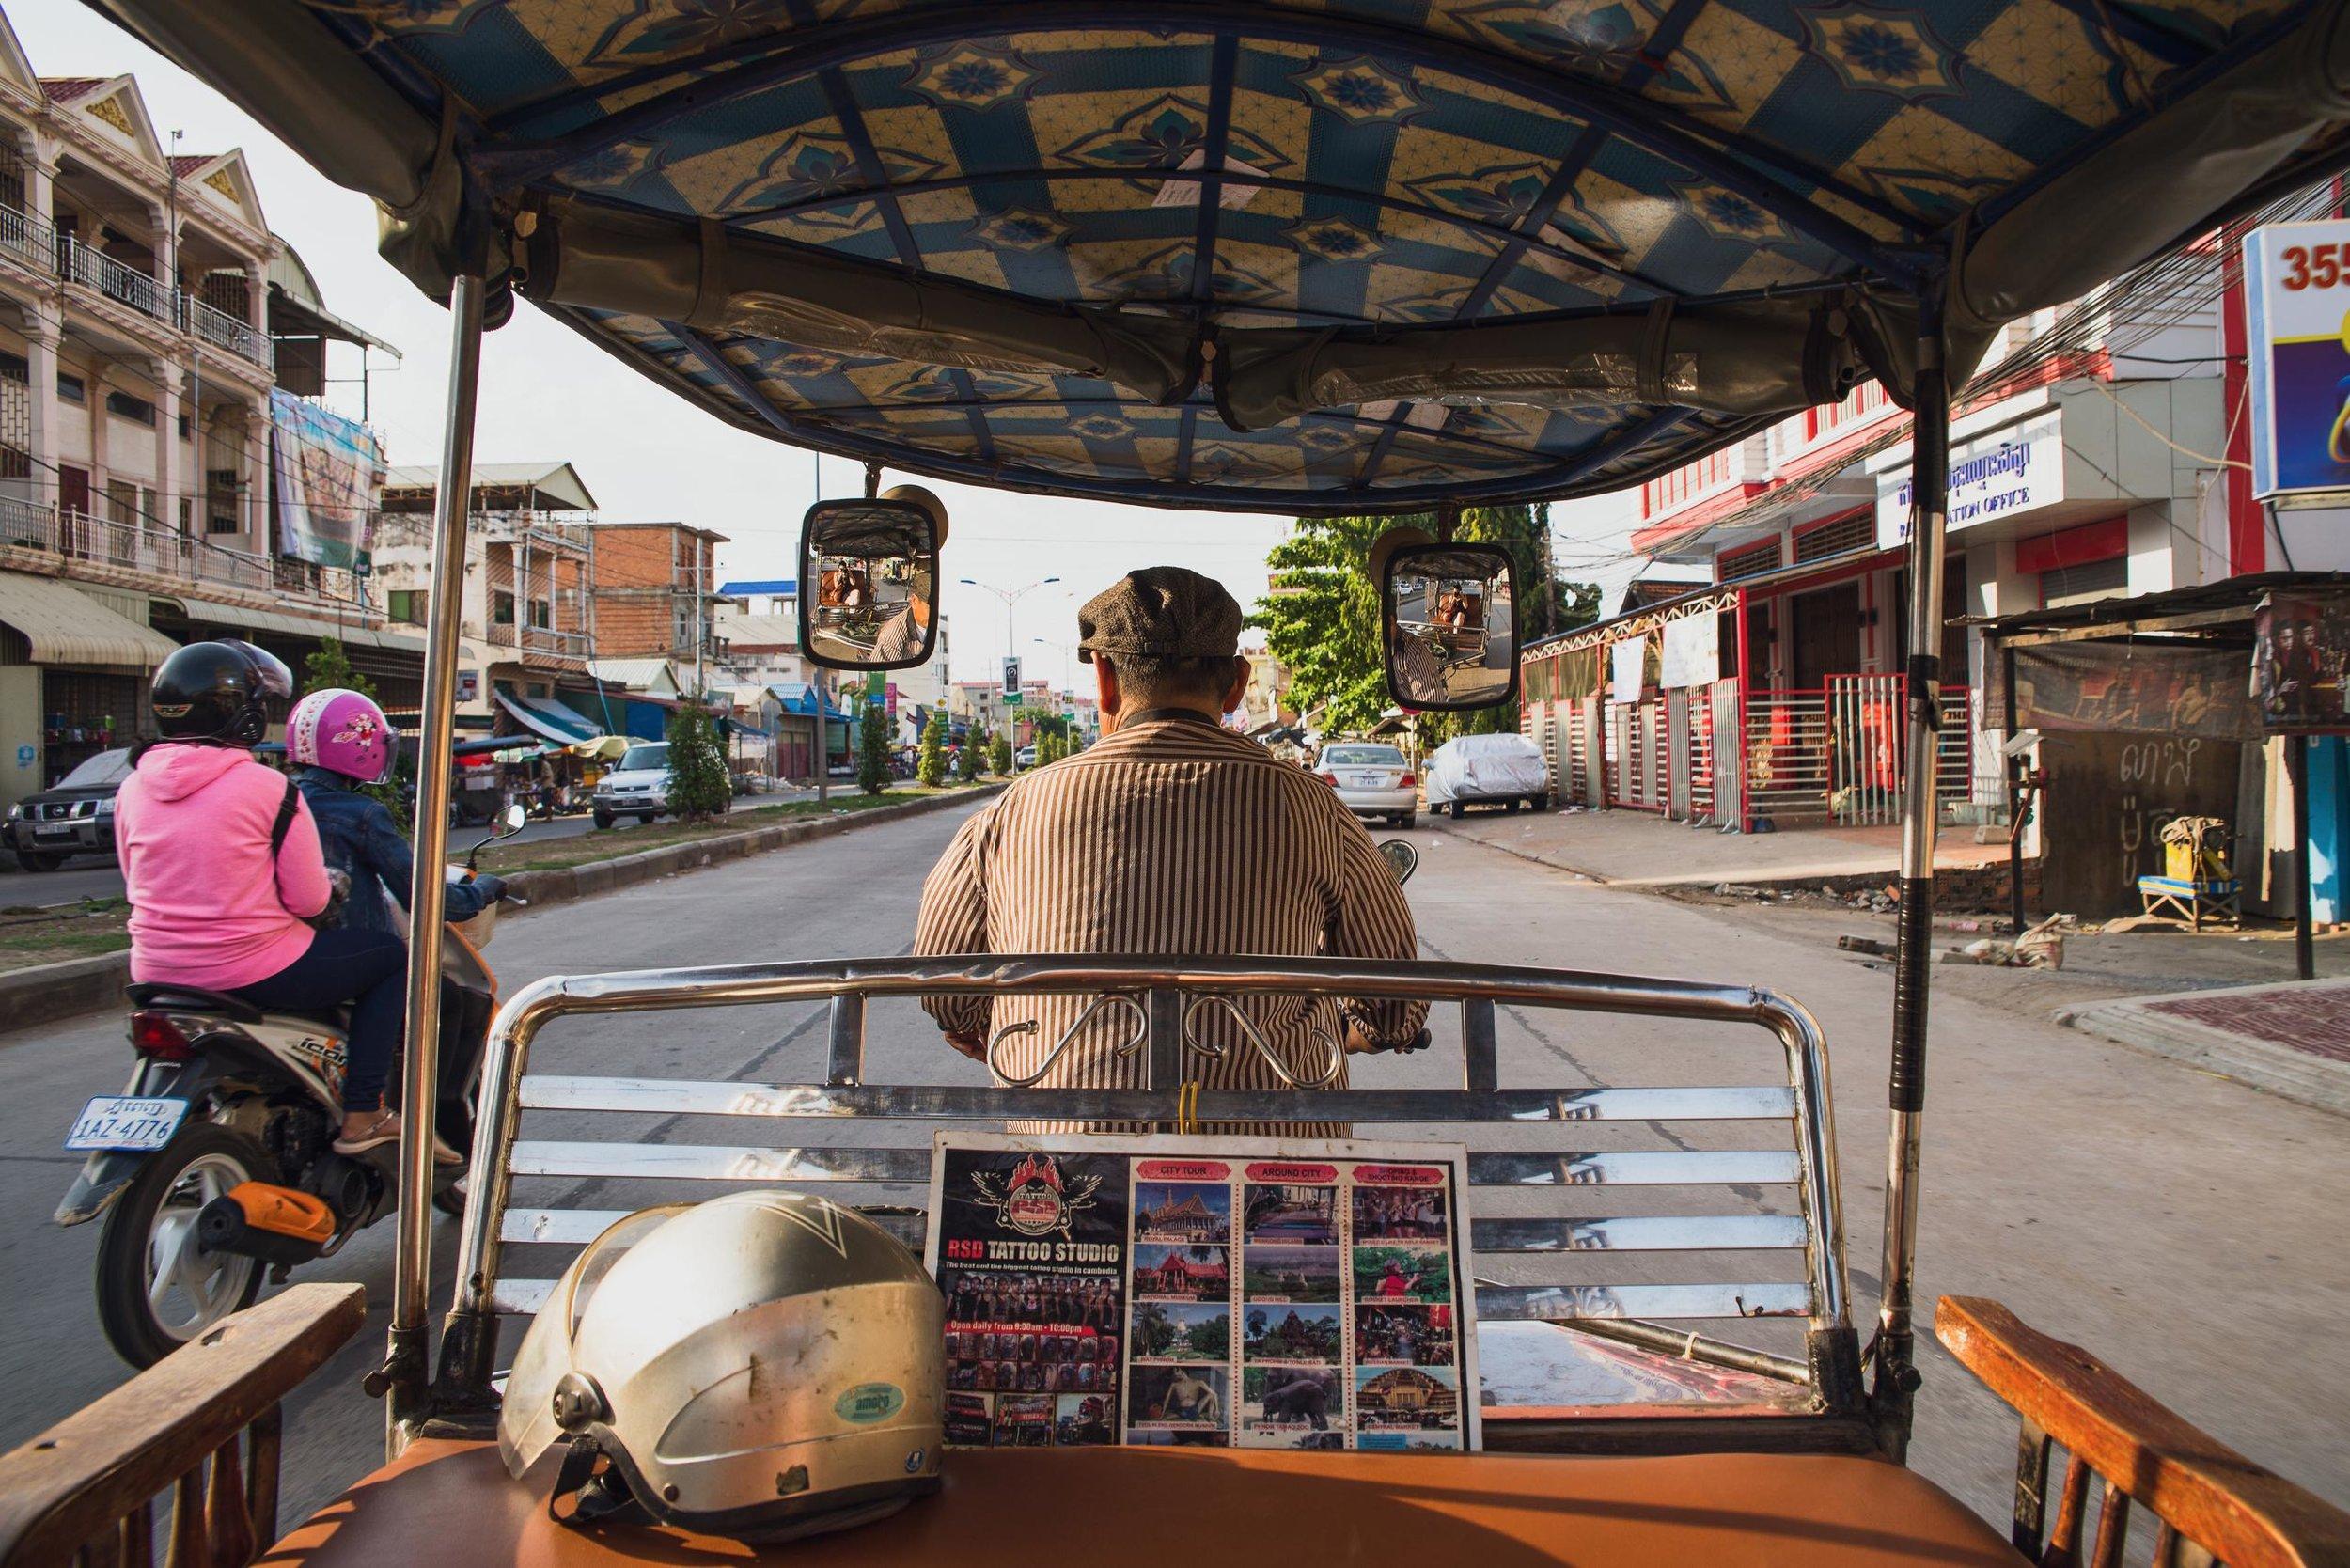 A tuk tuk driver navigates the streets Phnom Penh, Cambodia.